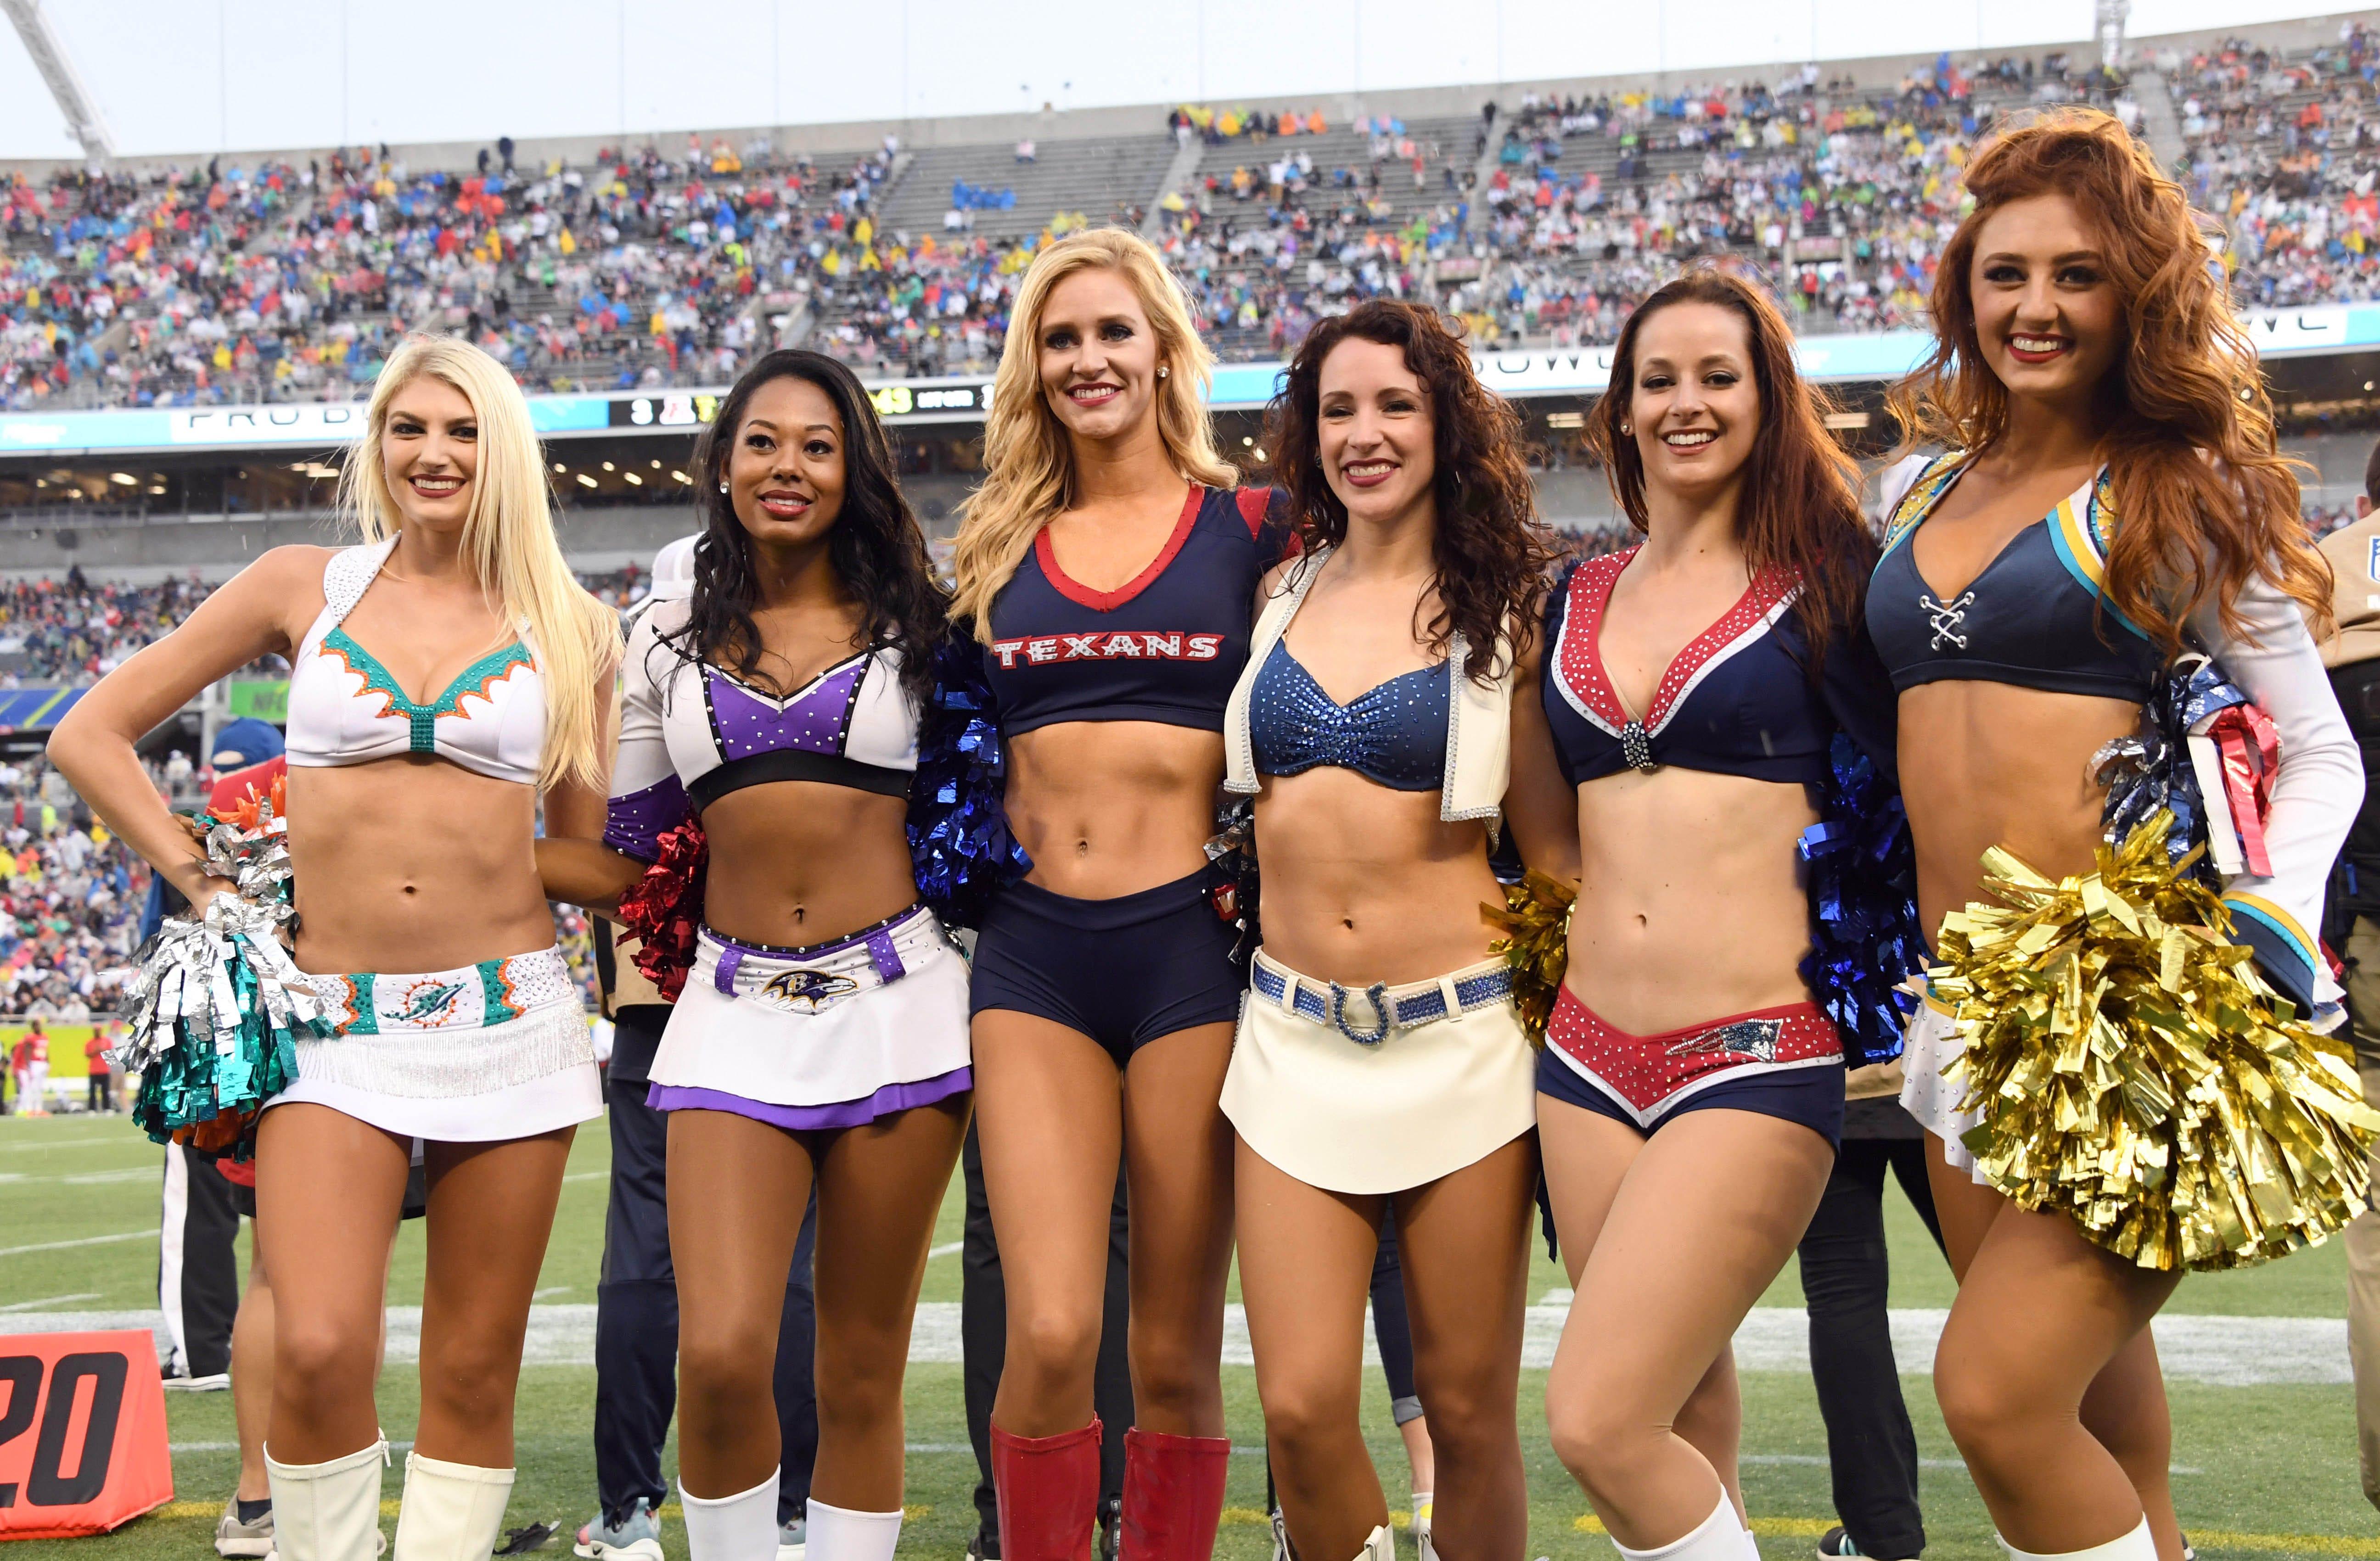 Do nba players hook up with cheerleaders